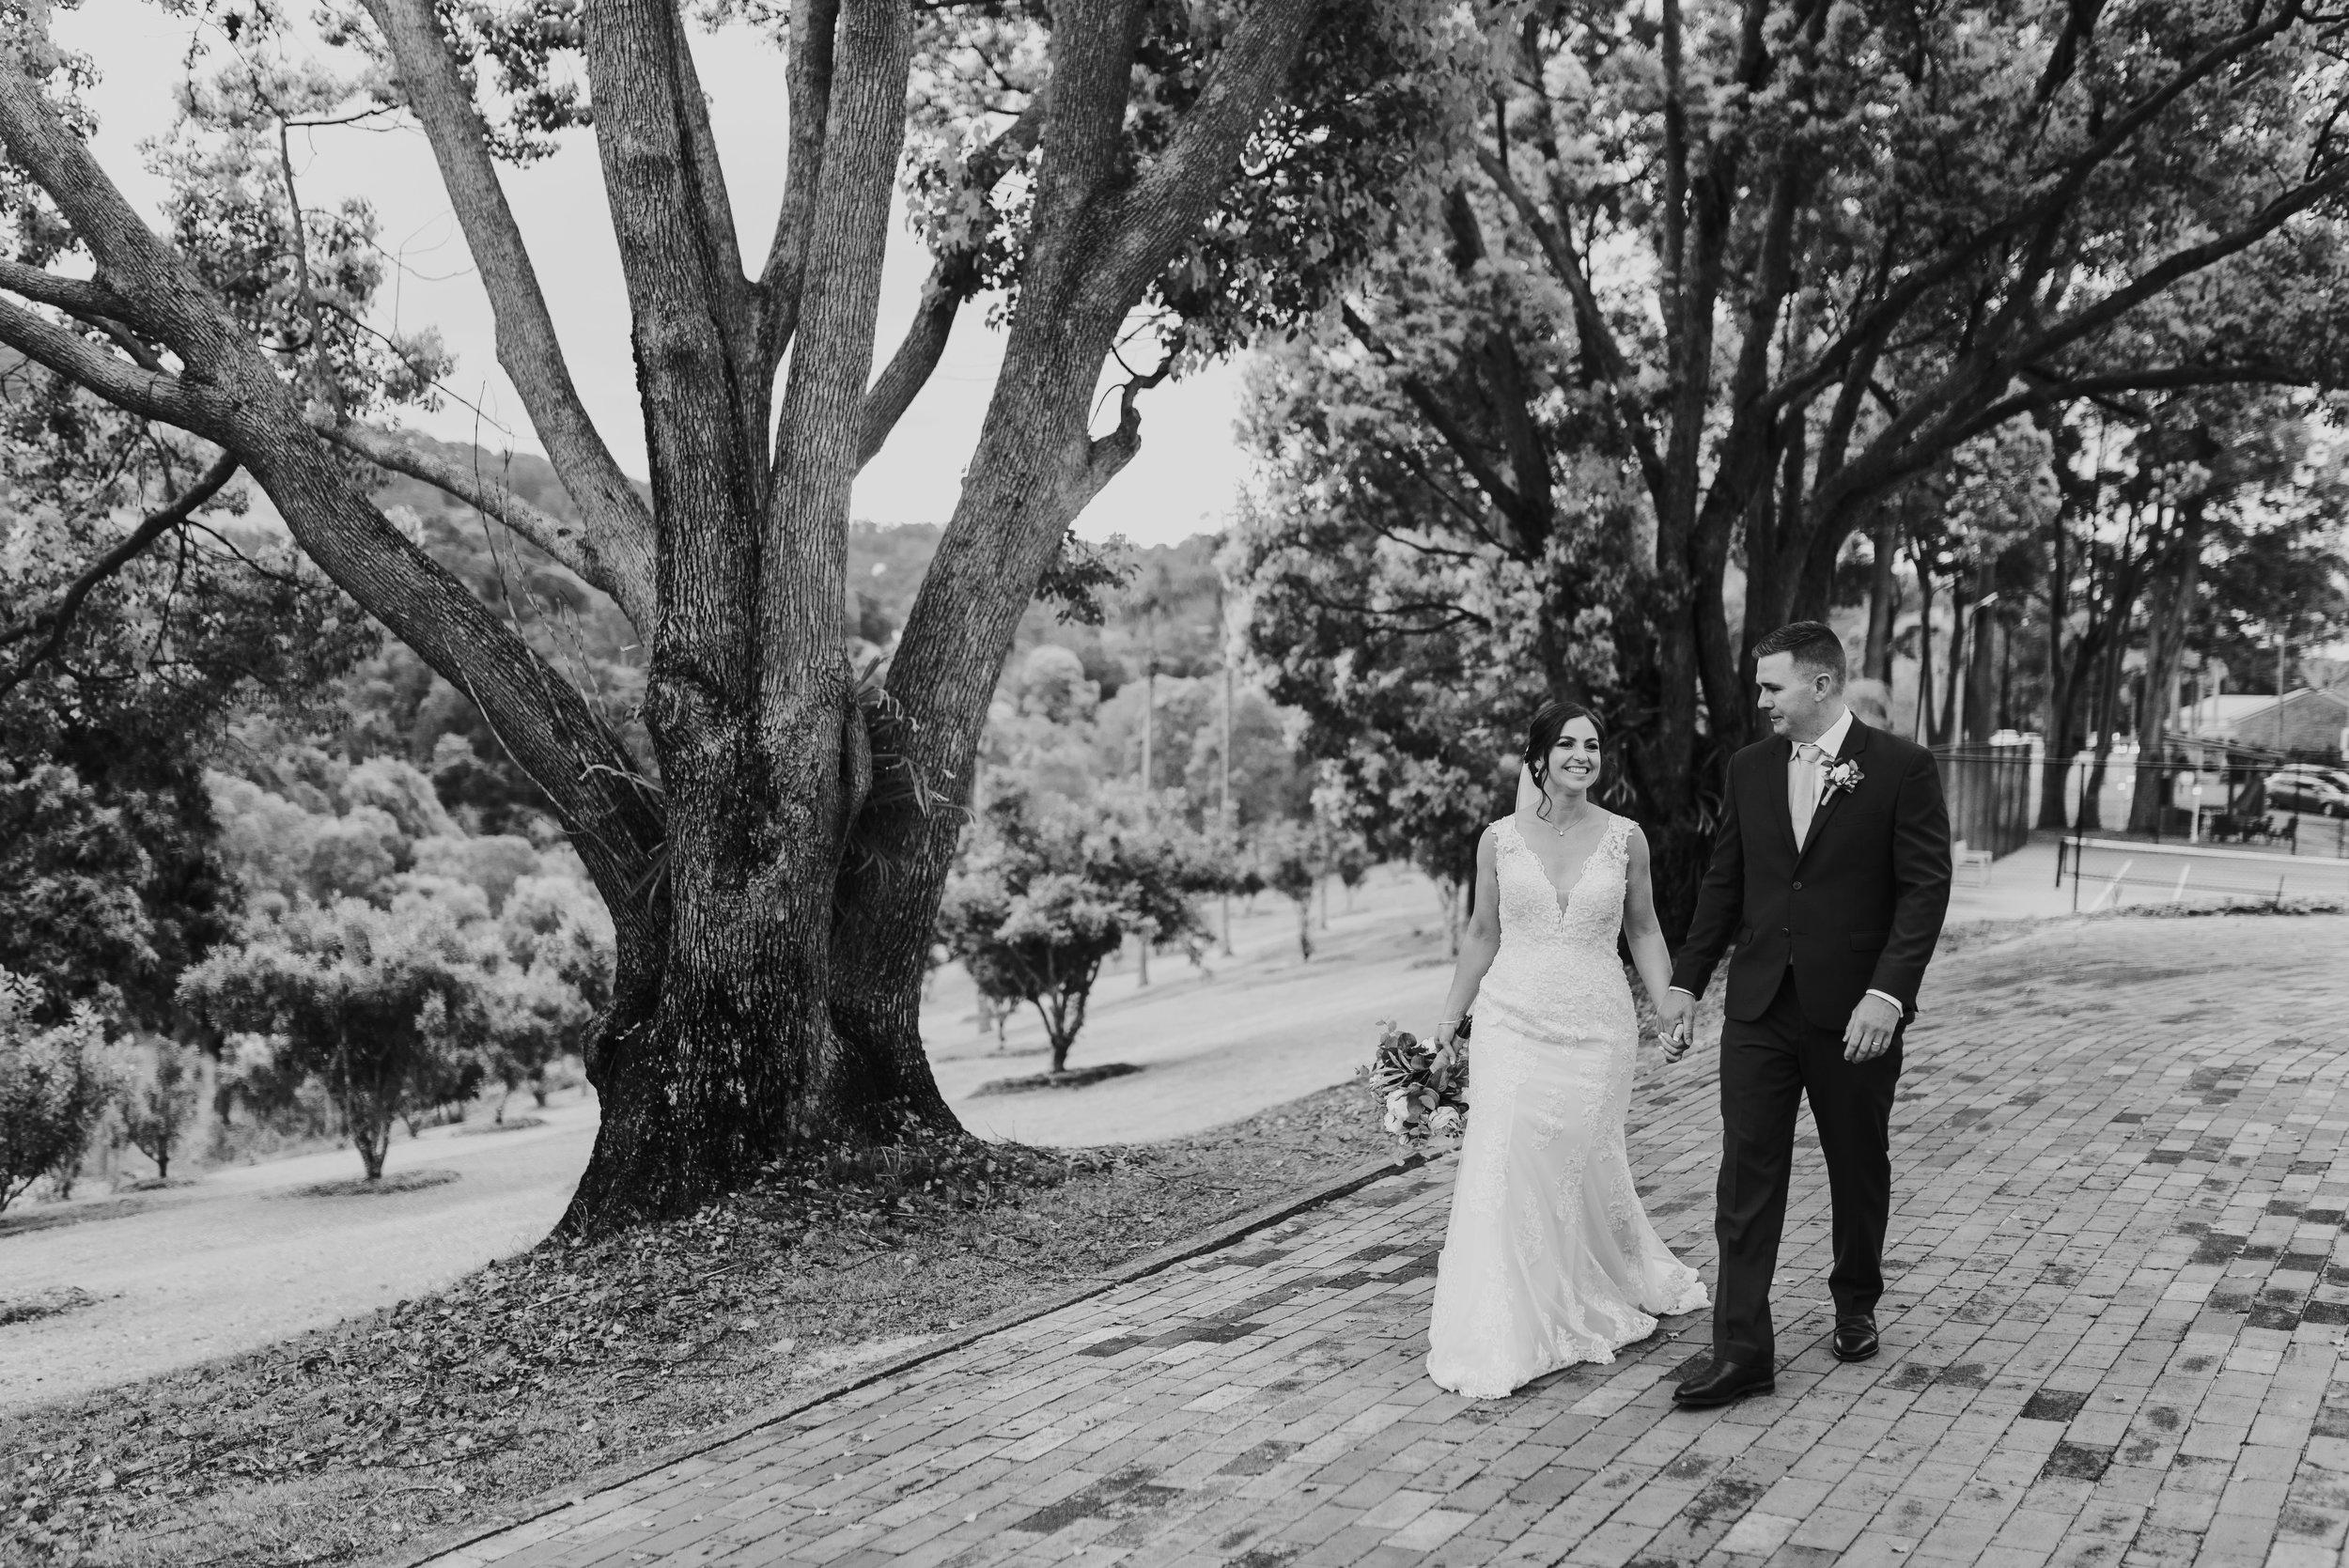 LAURENOLIVIA-austinvilla-estate-wedding-57.jpg